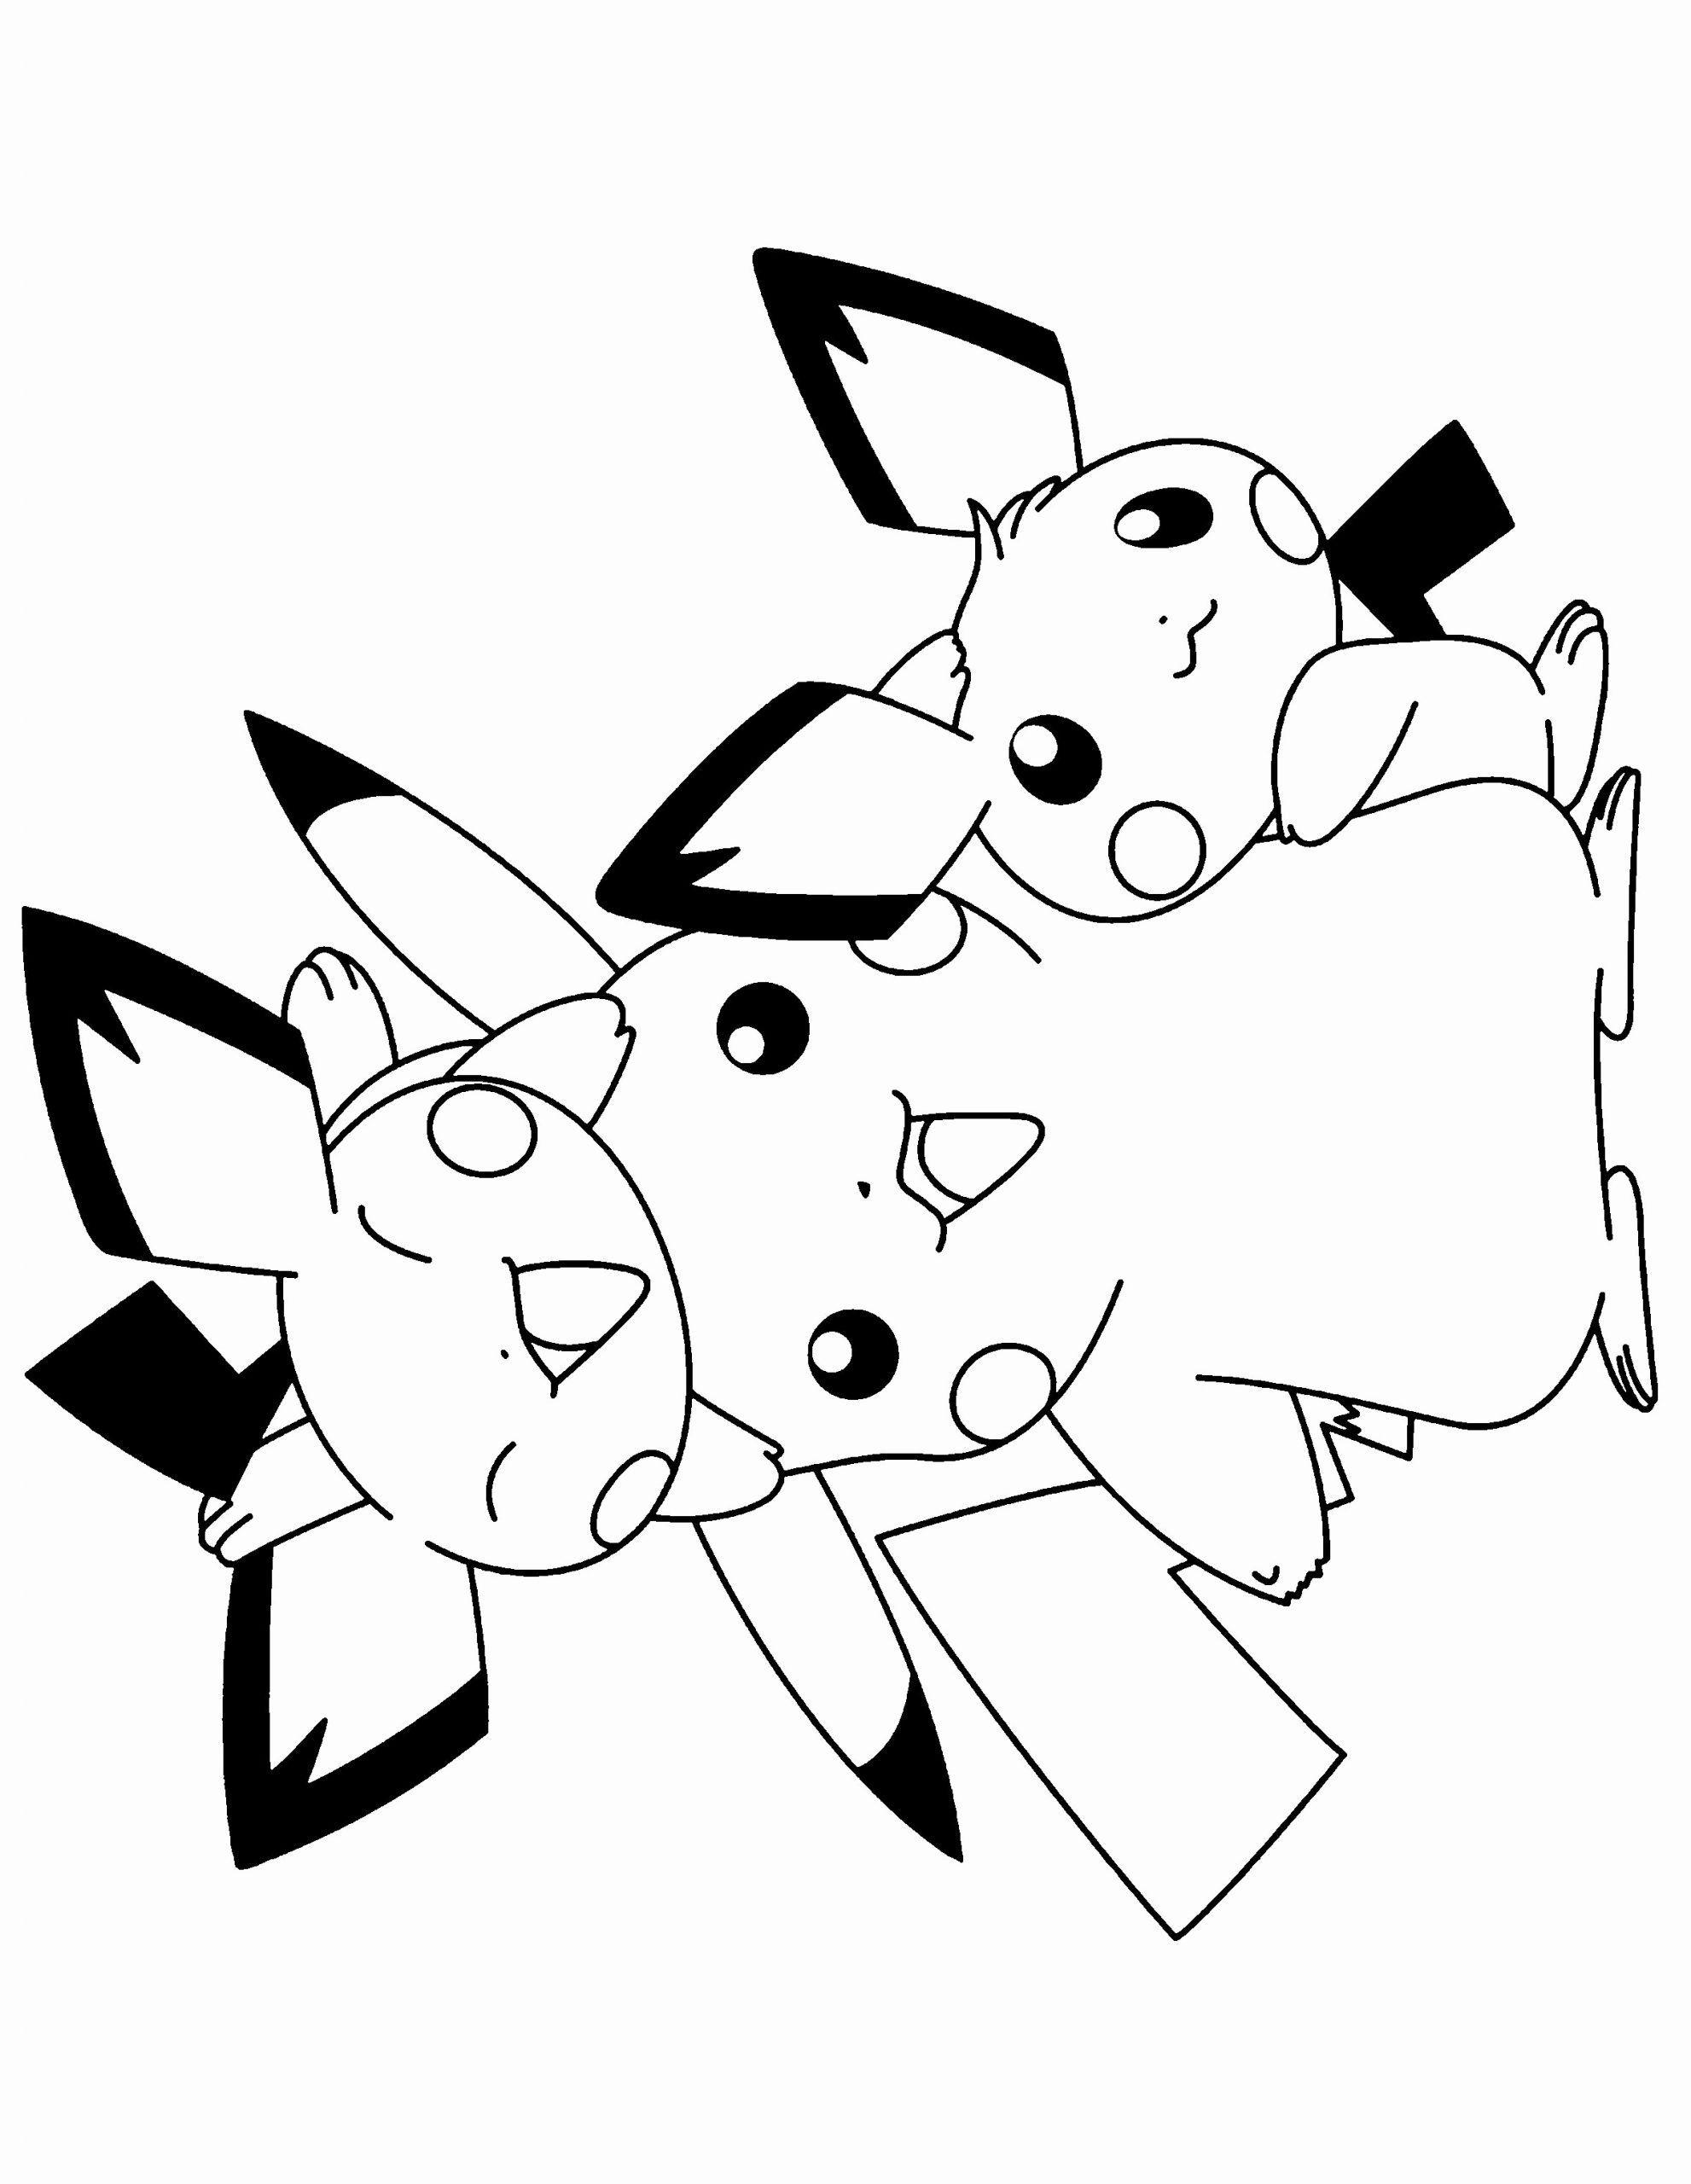 Alolan Raichu Coloring Page : alolan, raichu, coloring, Alolan, Raichu, Coloring, Beautiful, Pokemon, Pages,, Pikachu, Page,, Cartoon, Pages